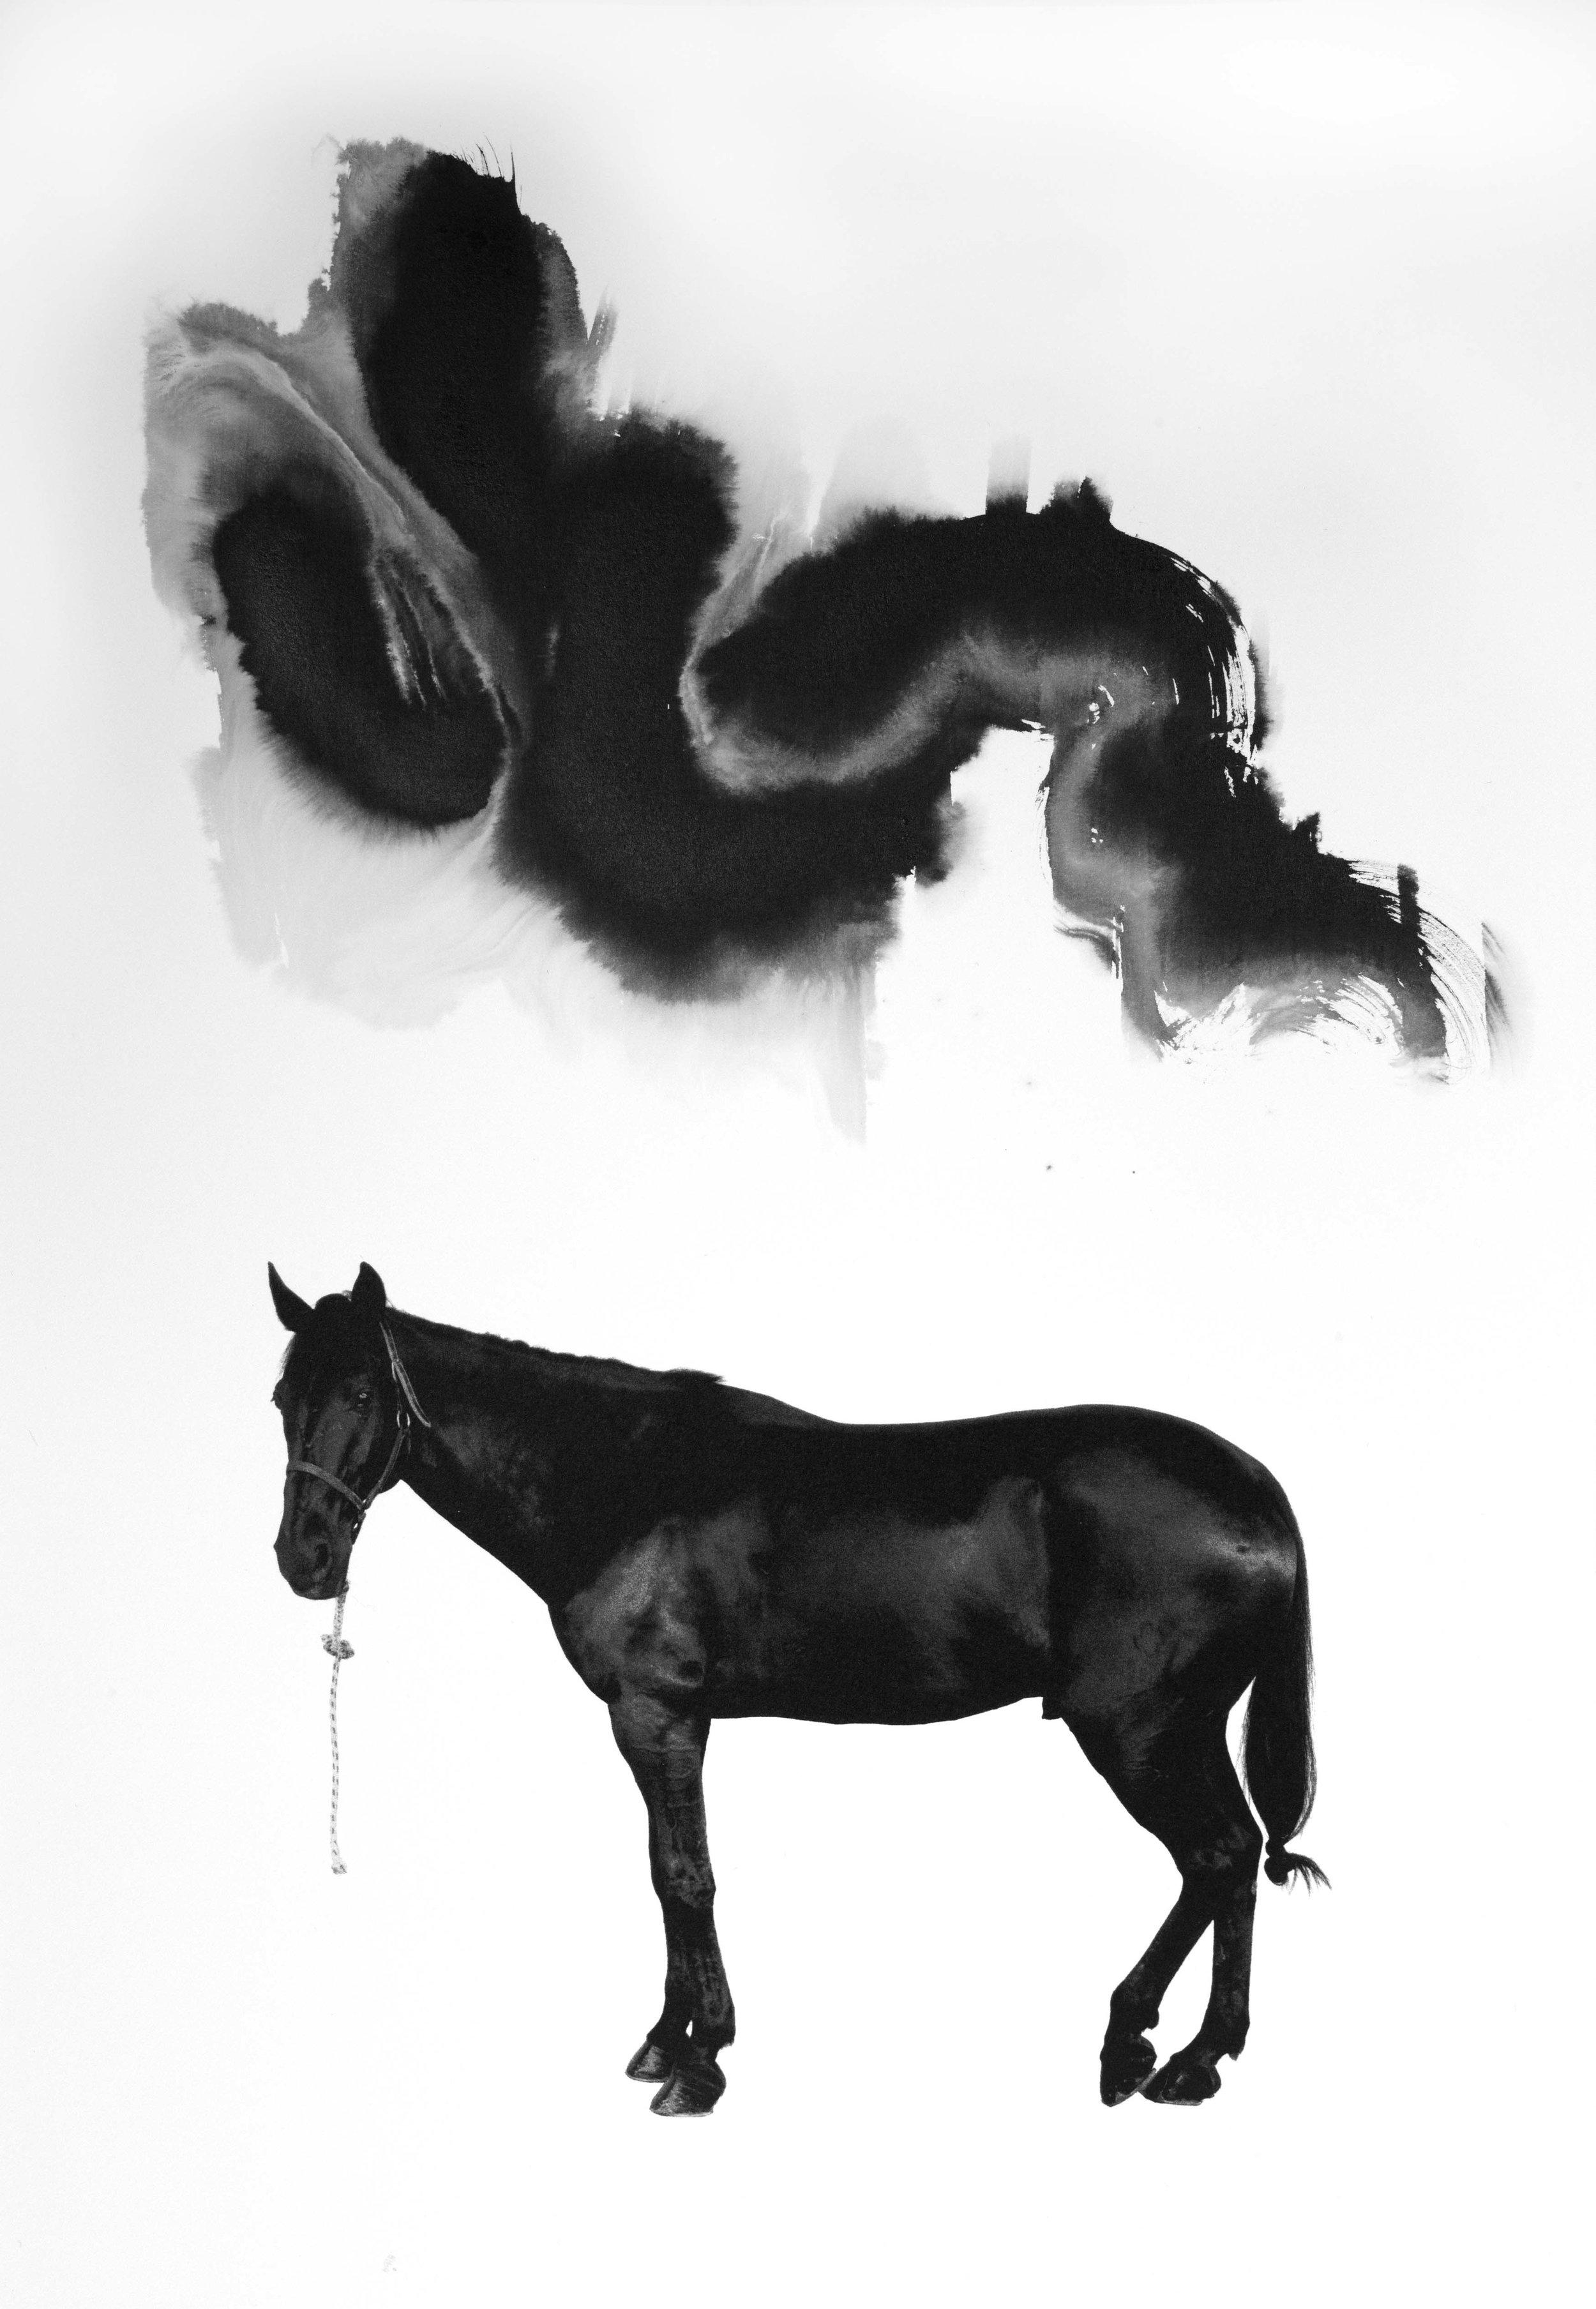 Noir 5 (Sold)